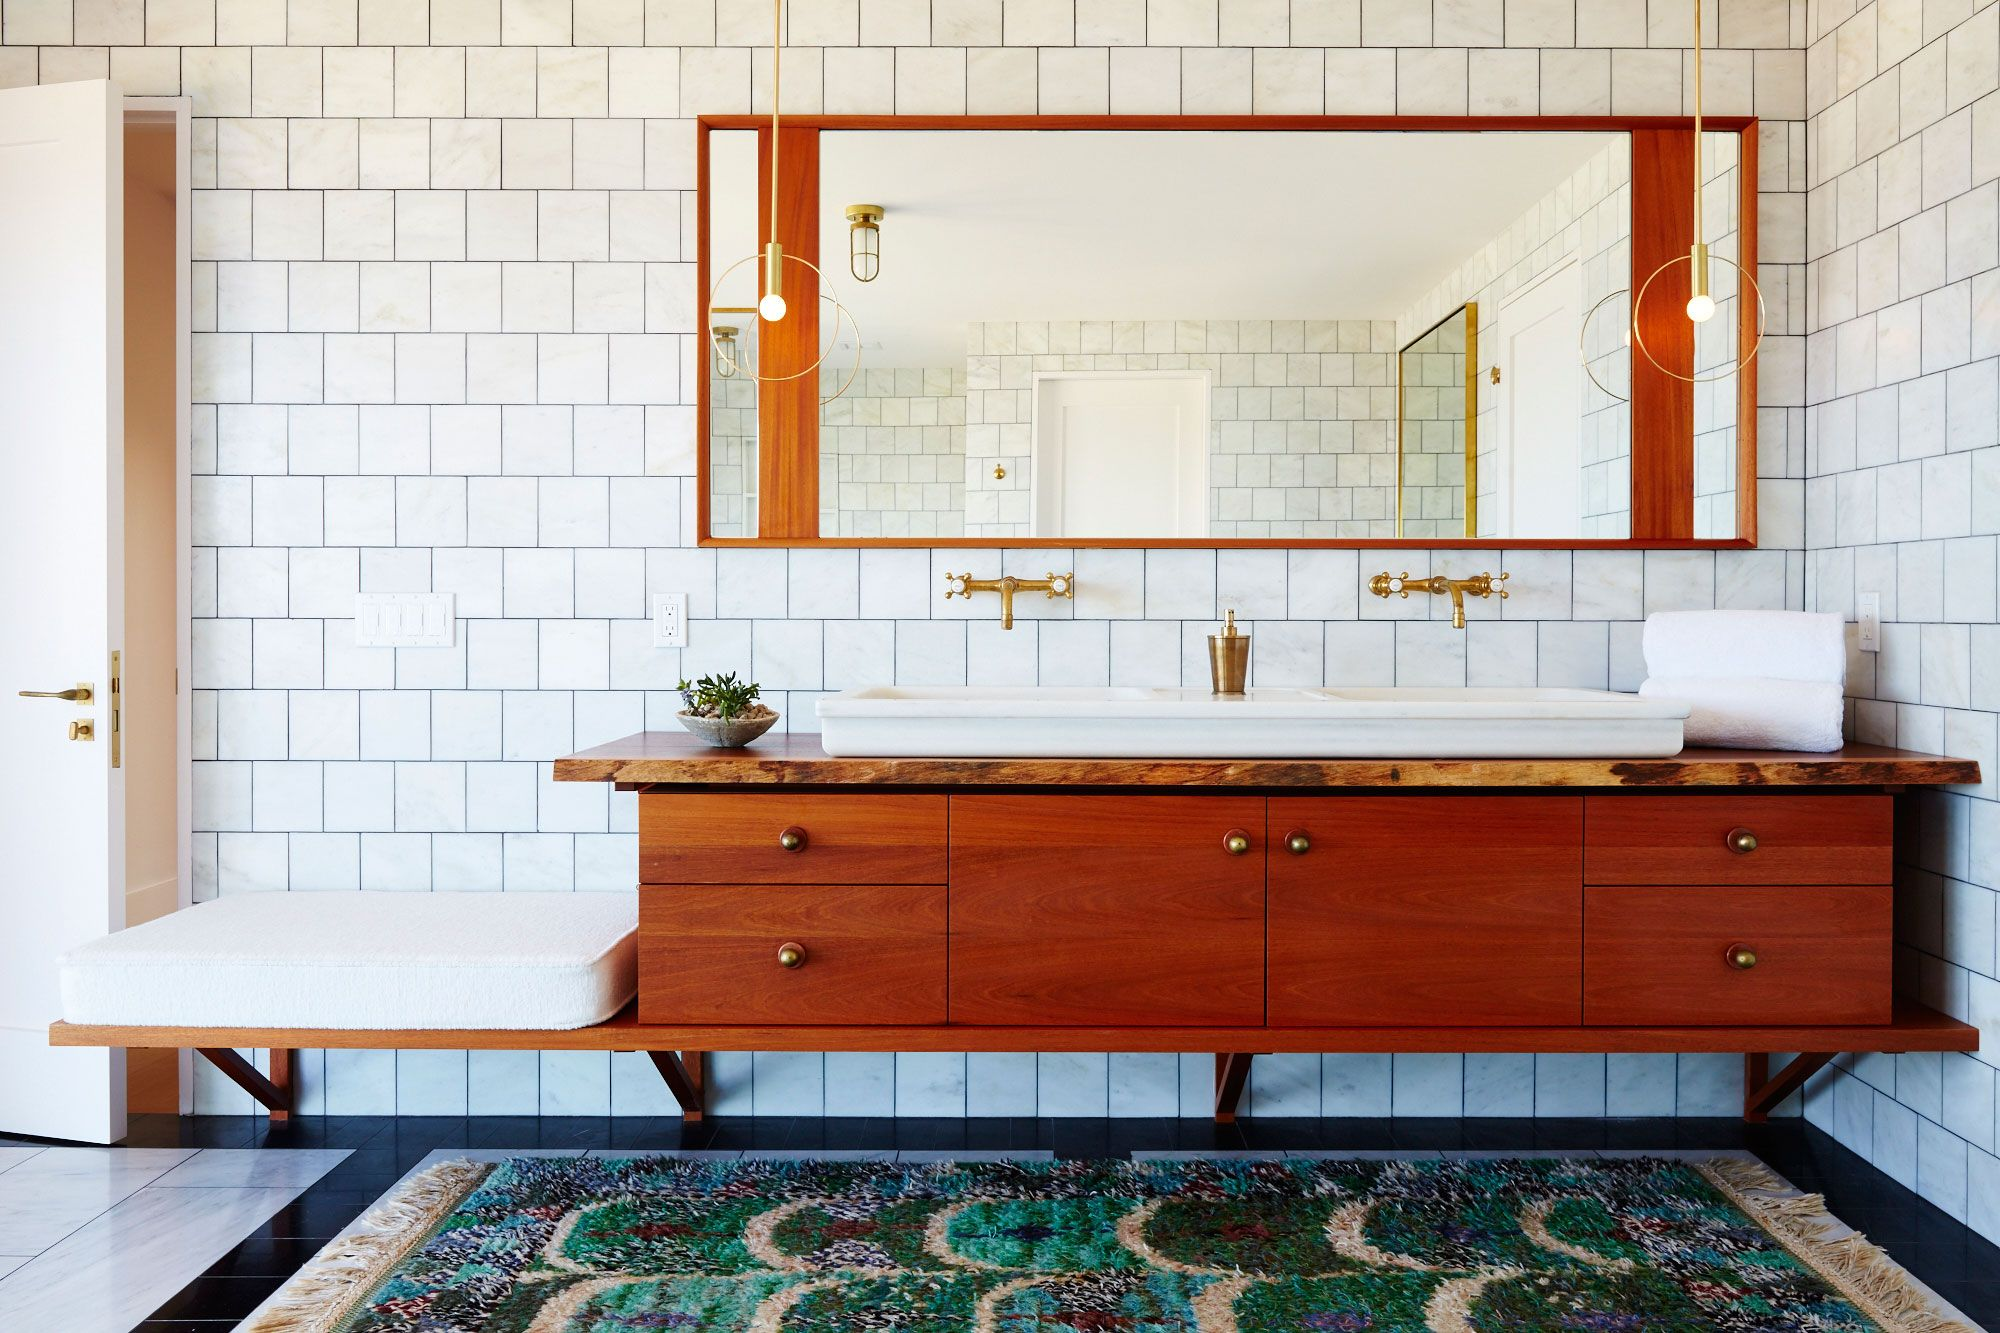 65 Fresh Bathroom Ideas To Make Your Space Feel Like A Spa